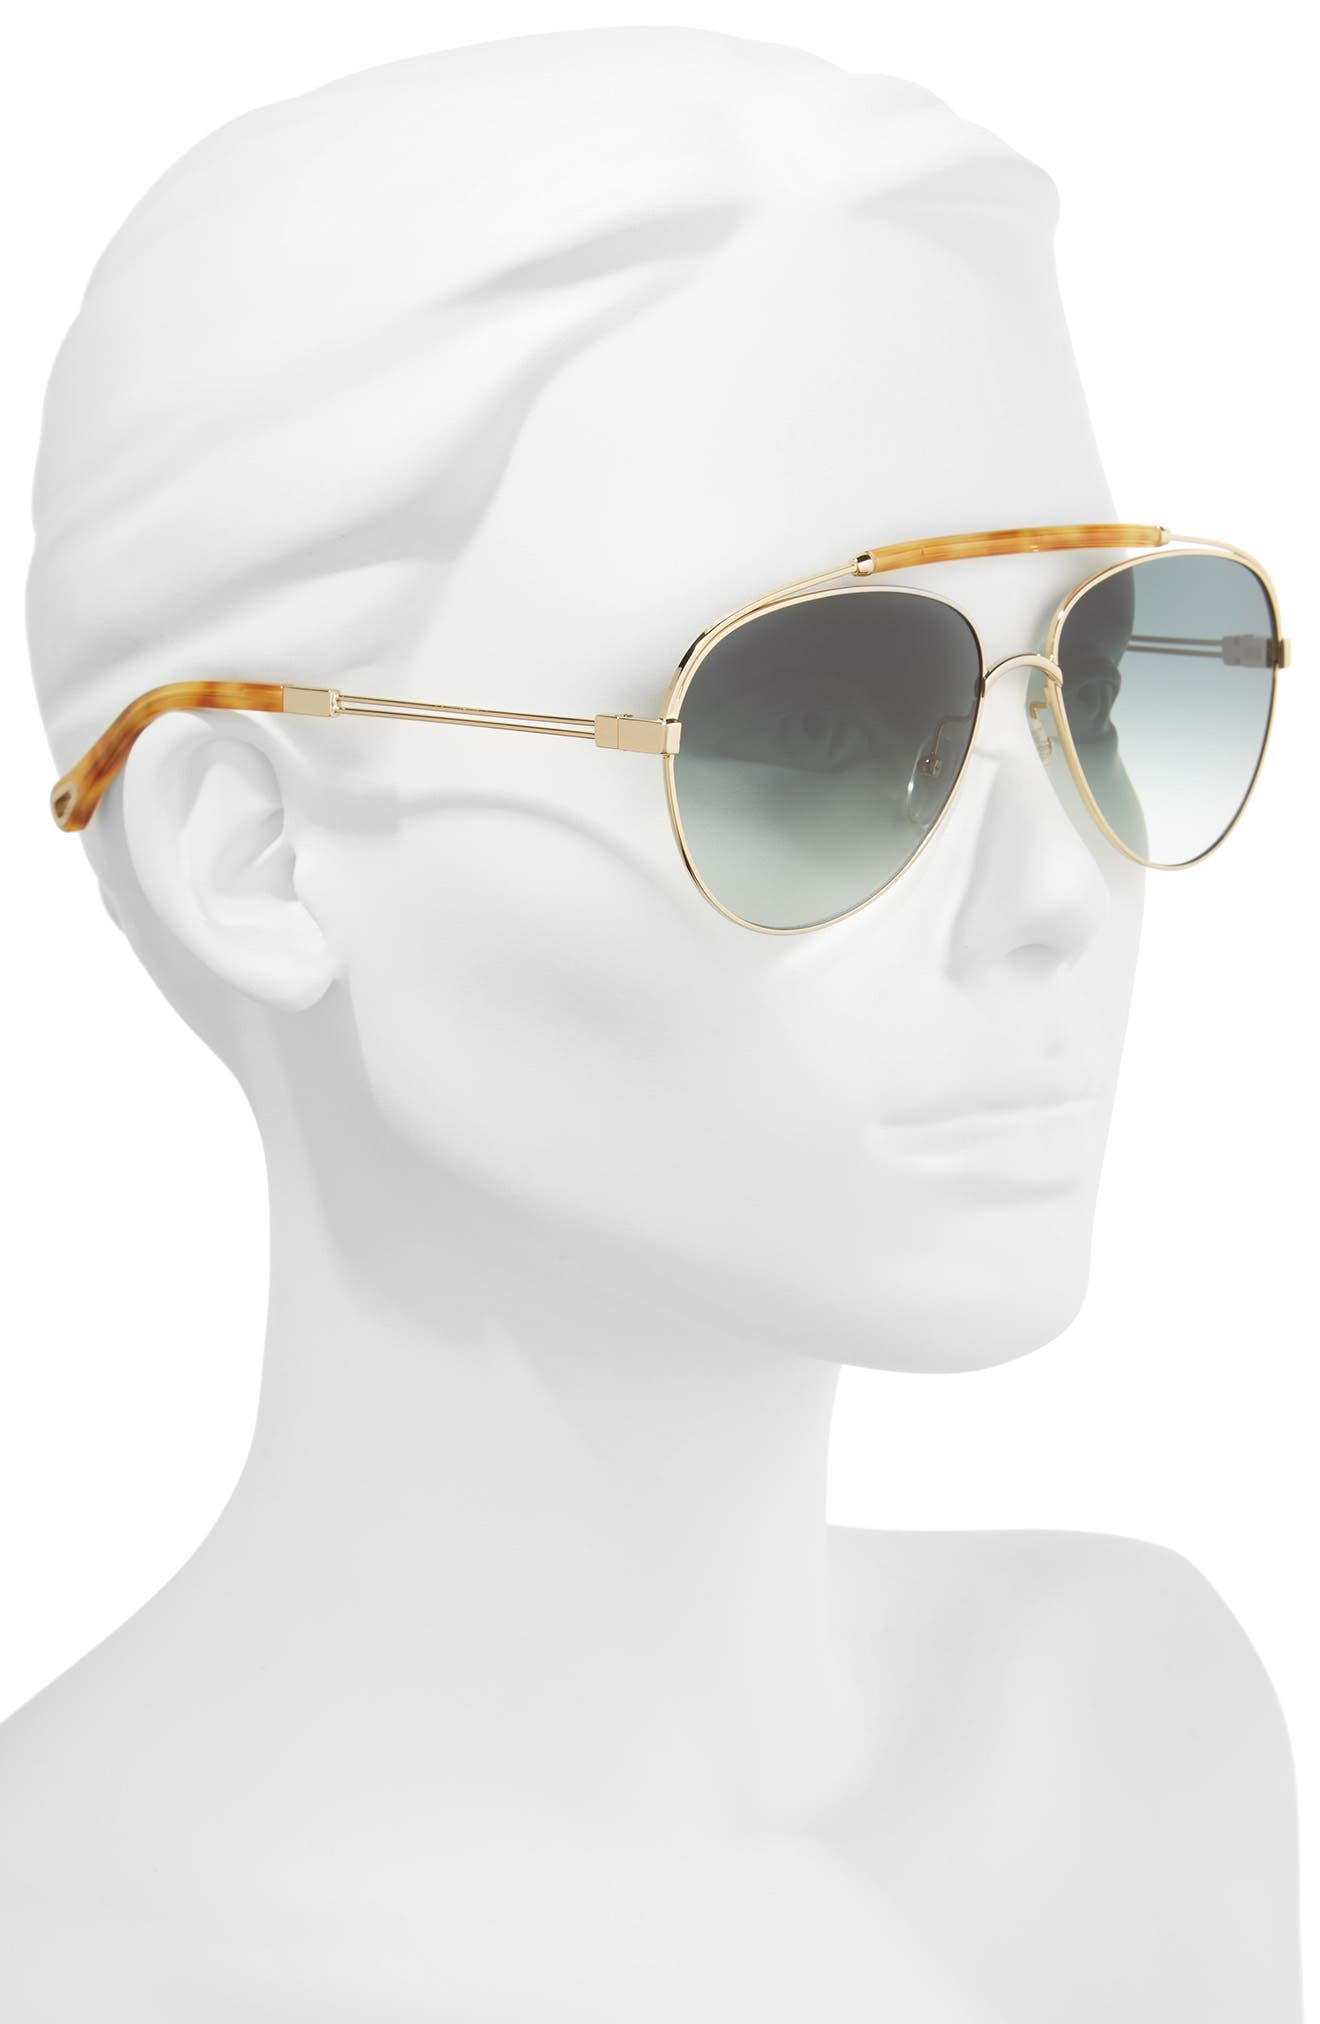 Jackie 59mm Aviator Sunglasses,                             Alternate thumbnail 2, color,                             GOLD/ BLONDE HAVANA